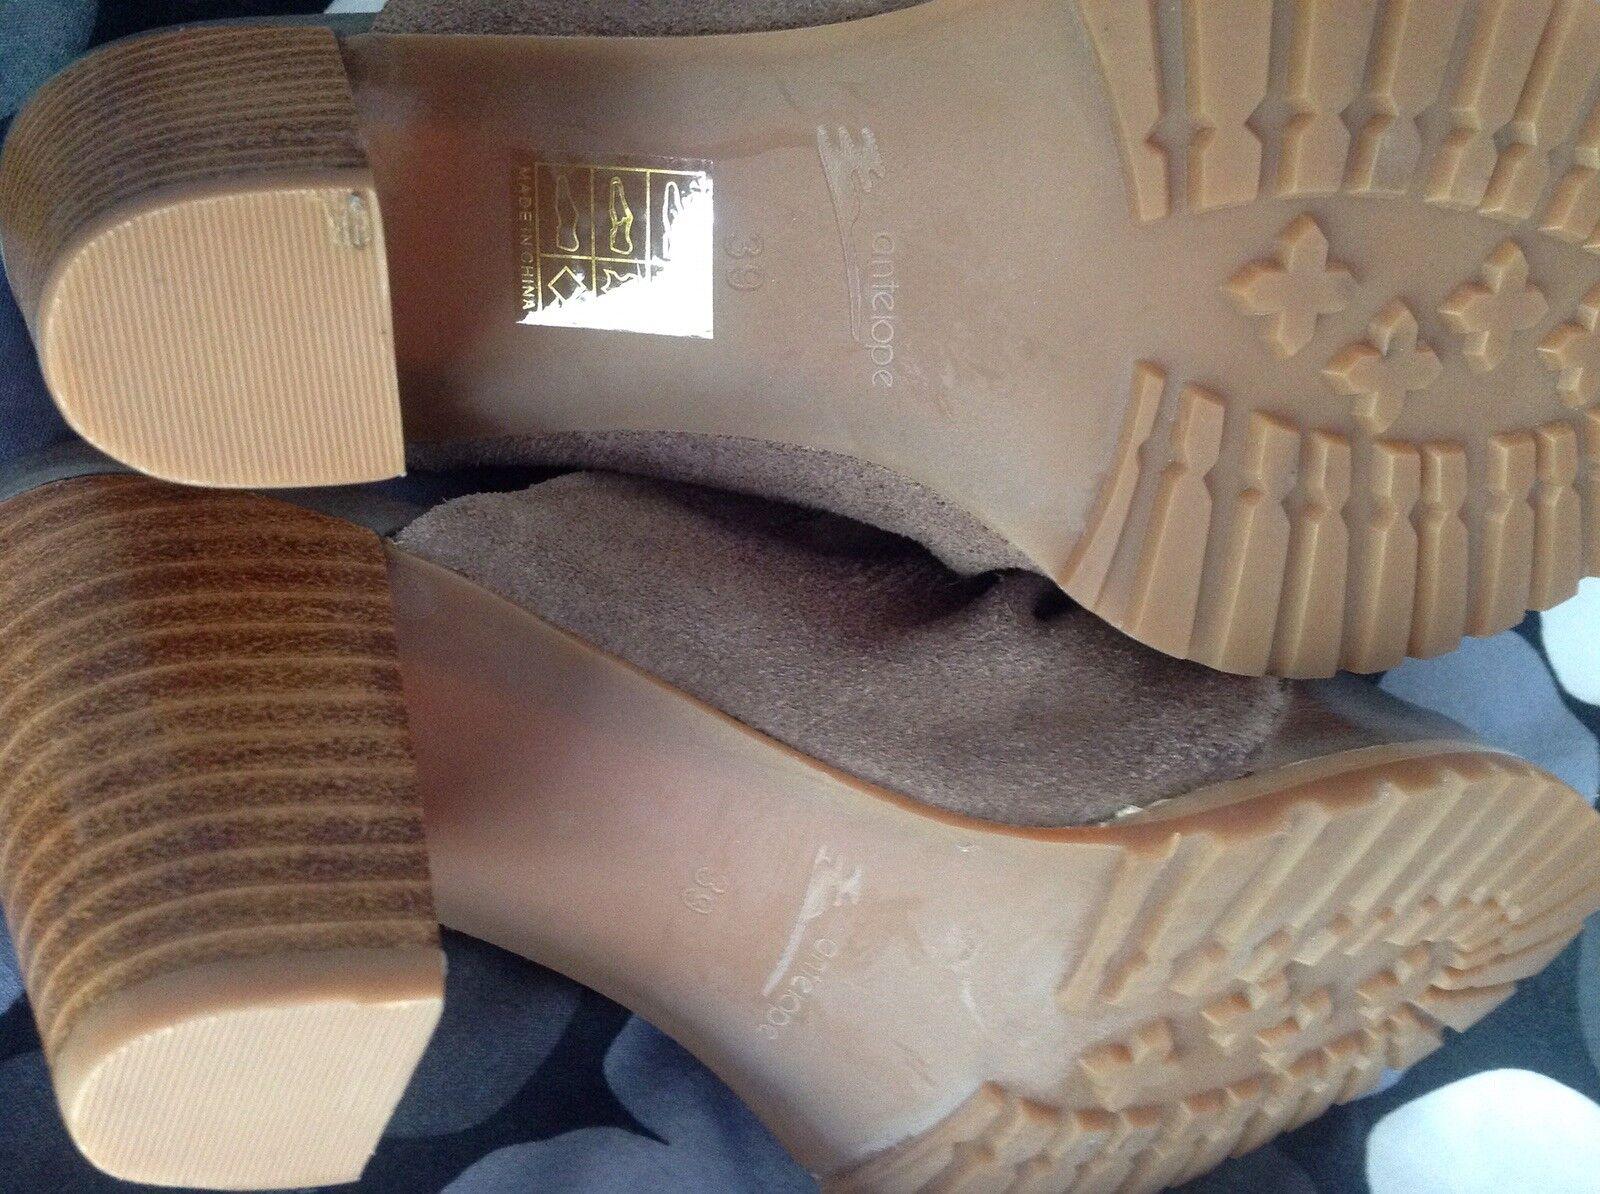 Antelope damen Mules Clogs High Heel Slip On schuhe braun MRP Größe 39, 7 - MRP braun  189 535da4